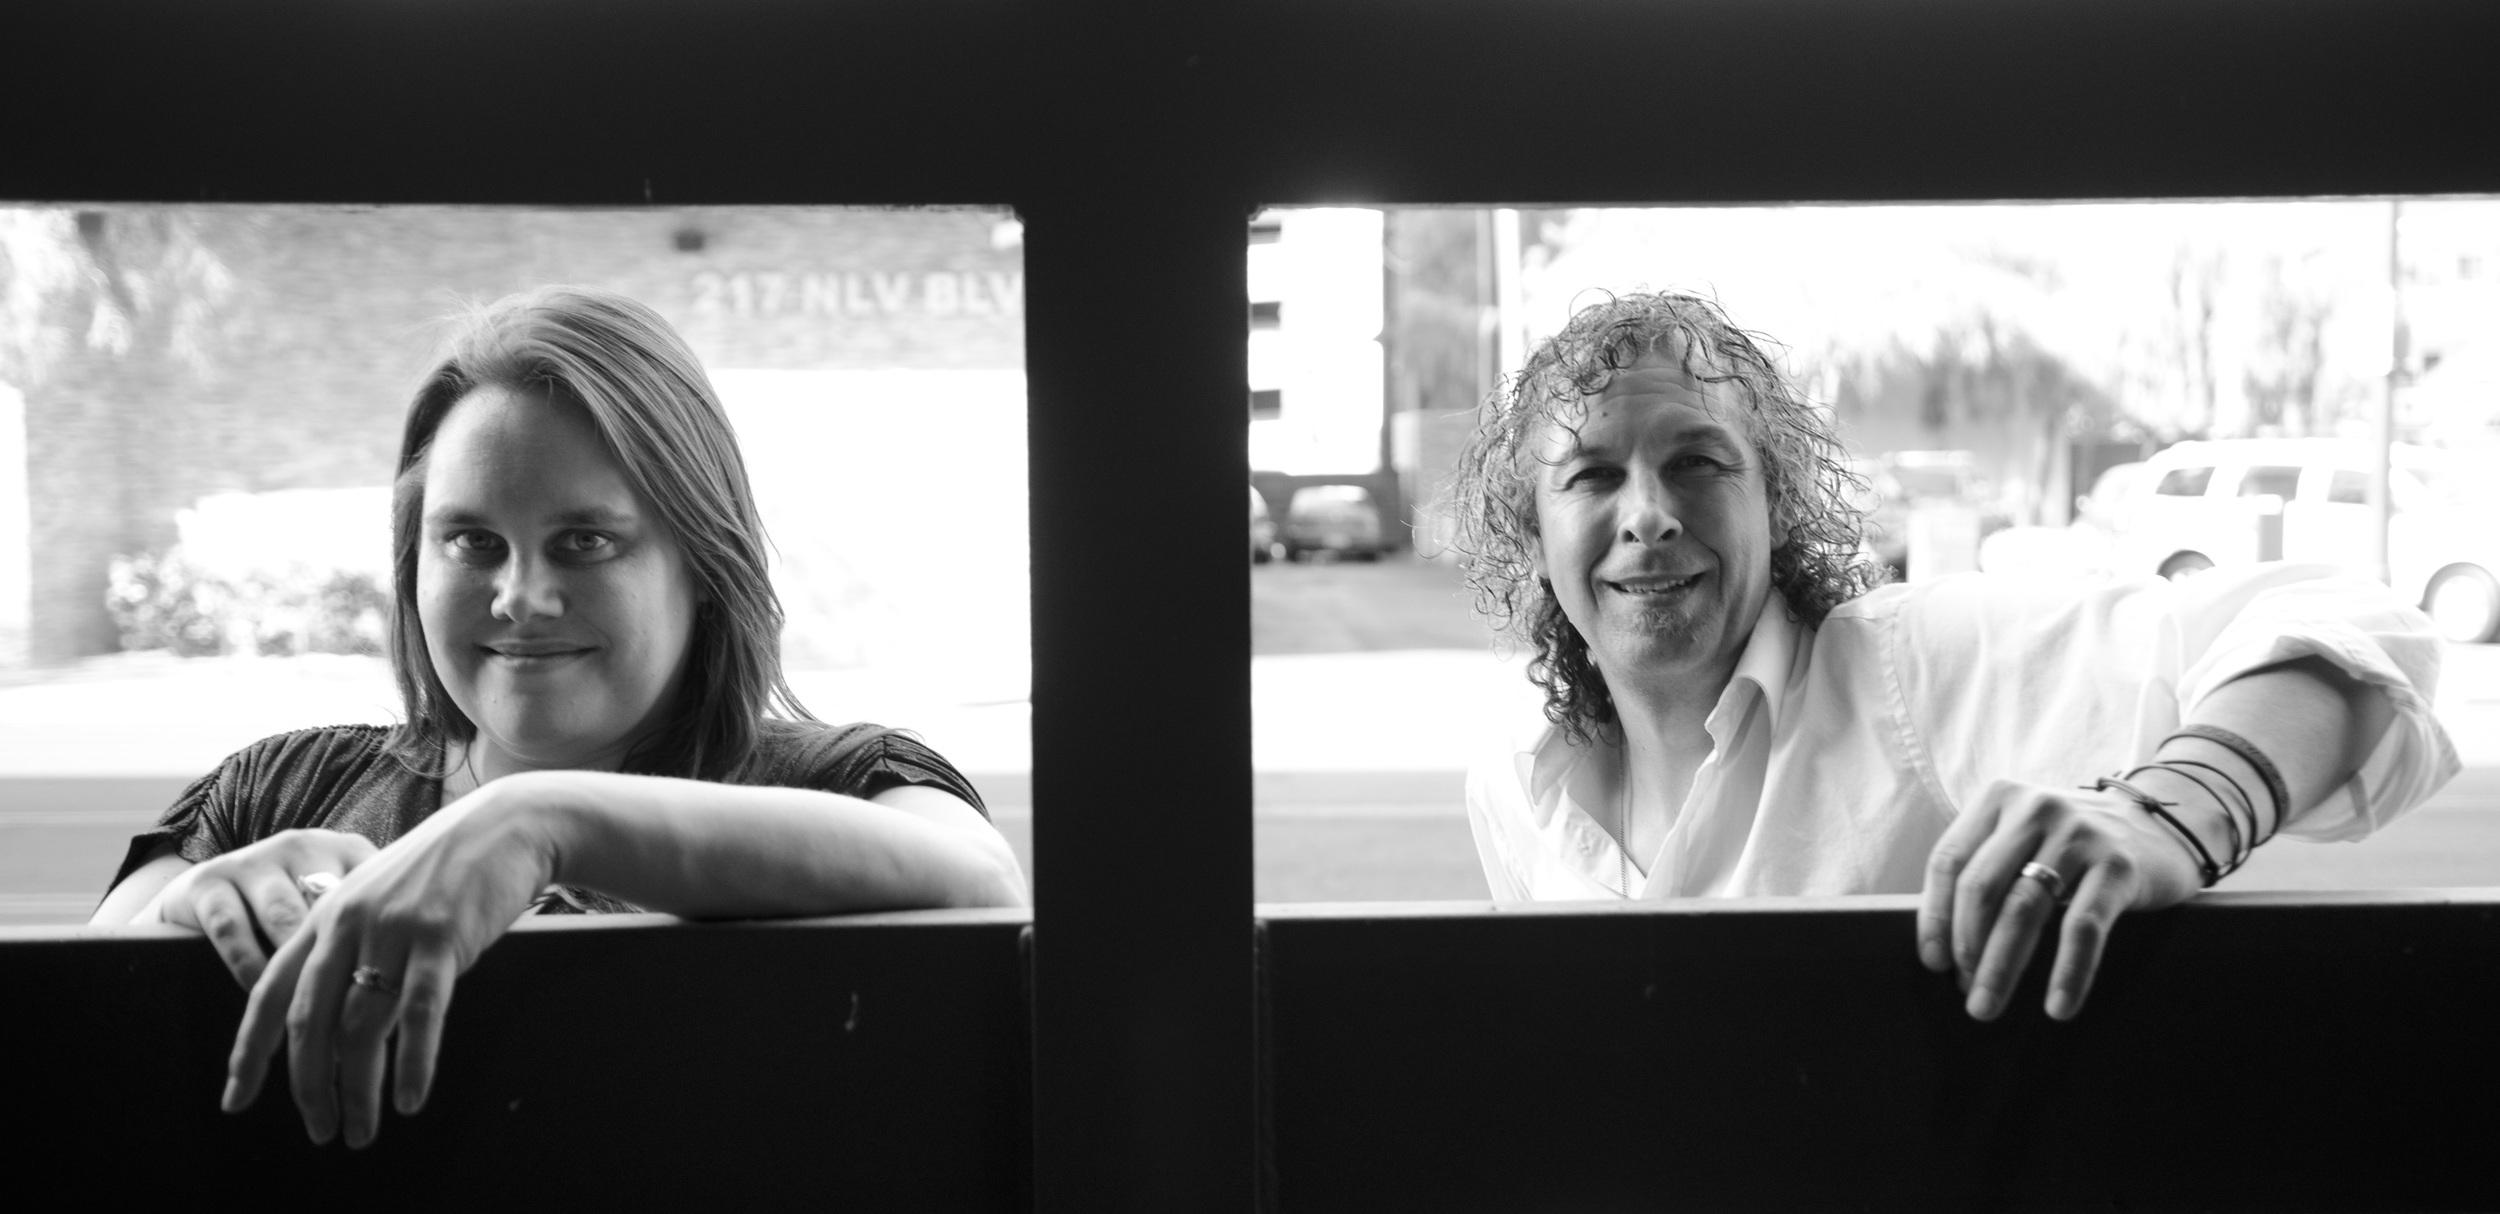 Isabelle and Chris Guzman of Las Treal. Las Vegas, NV.